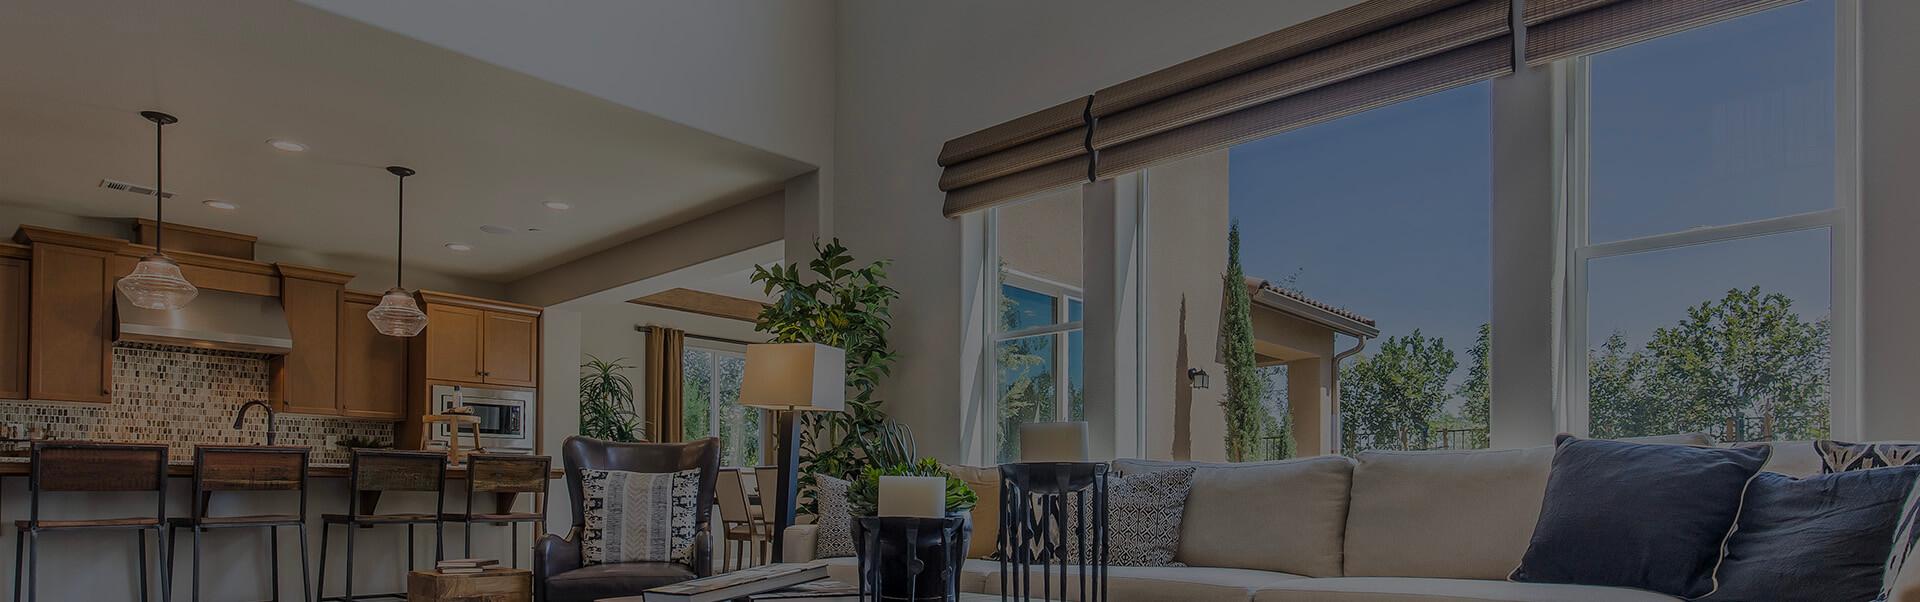 replacement windows in tucson az